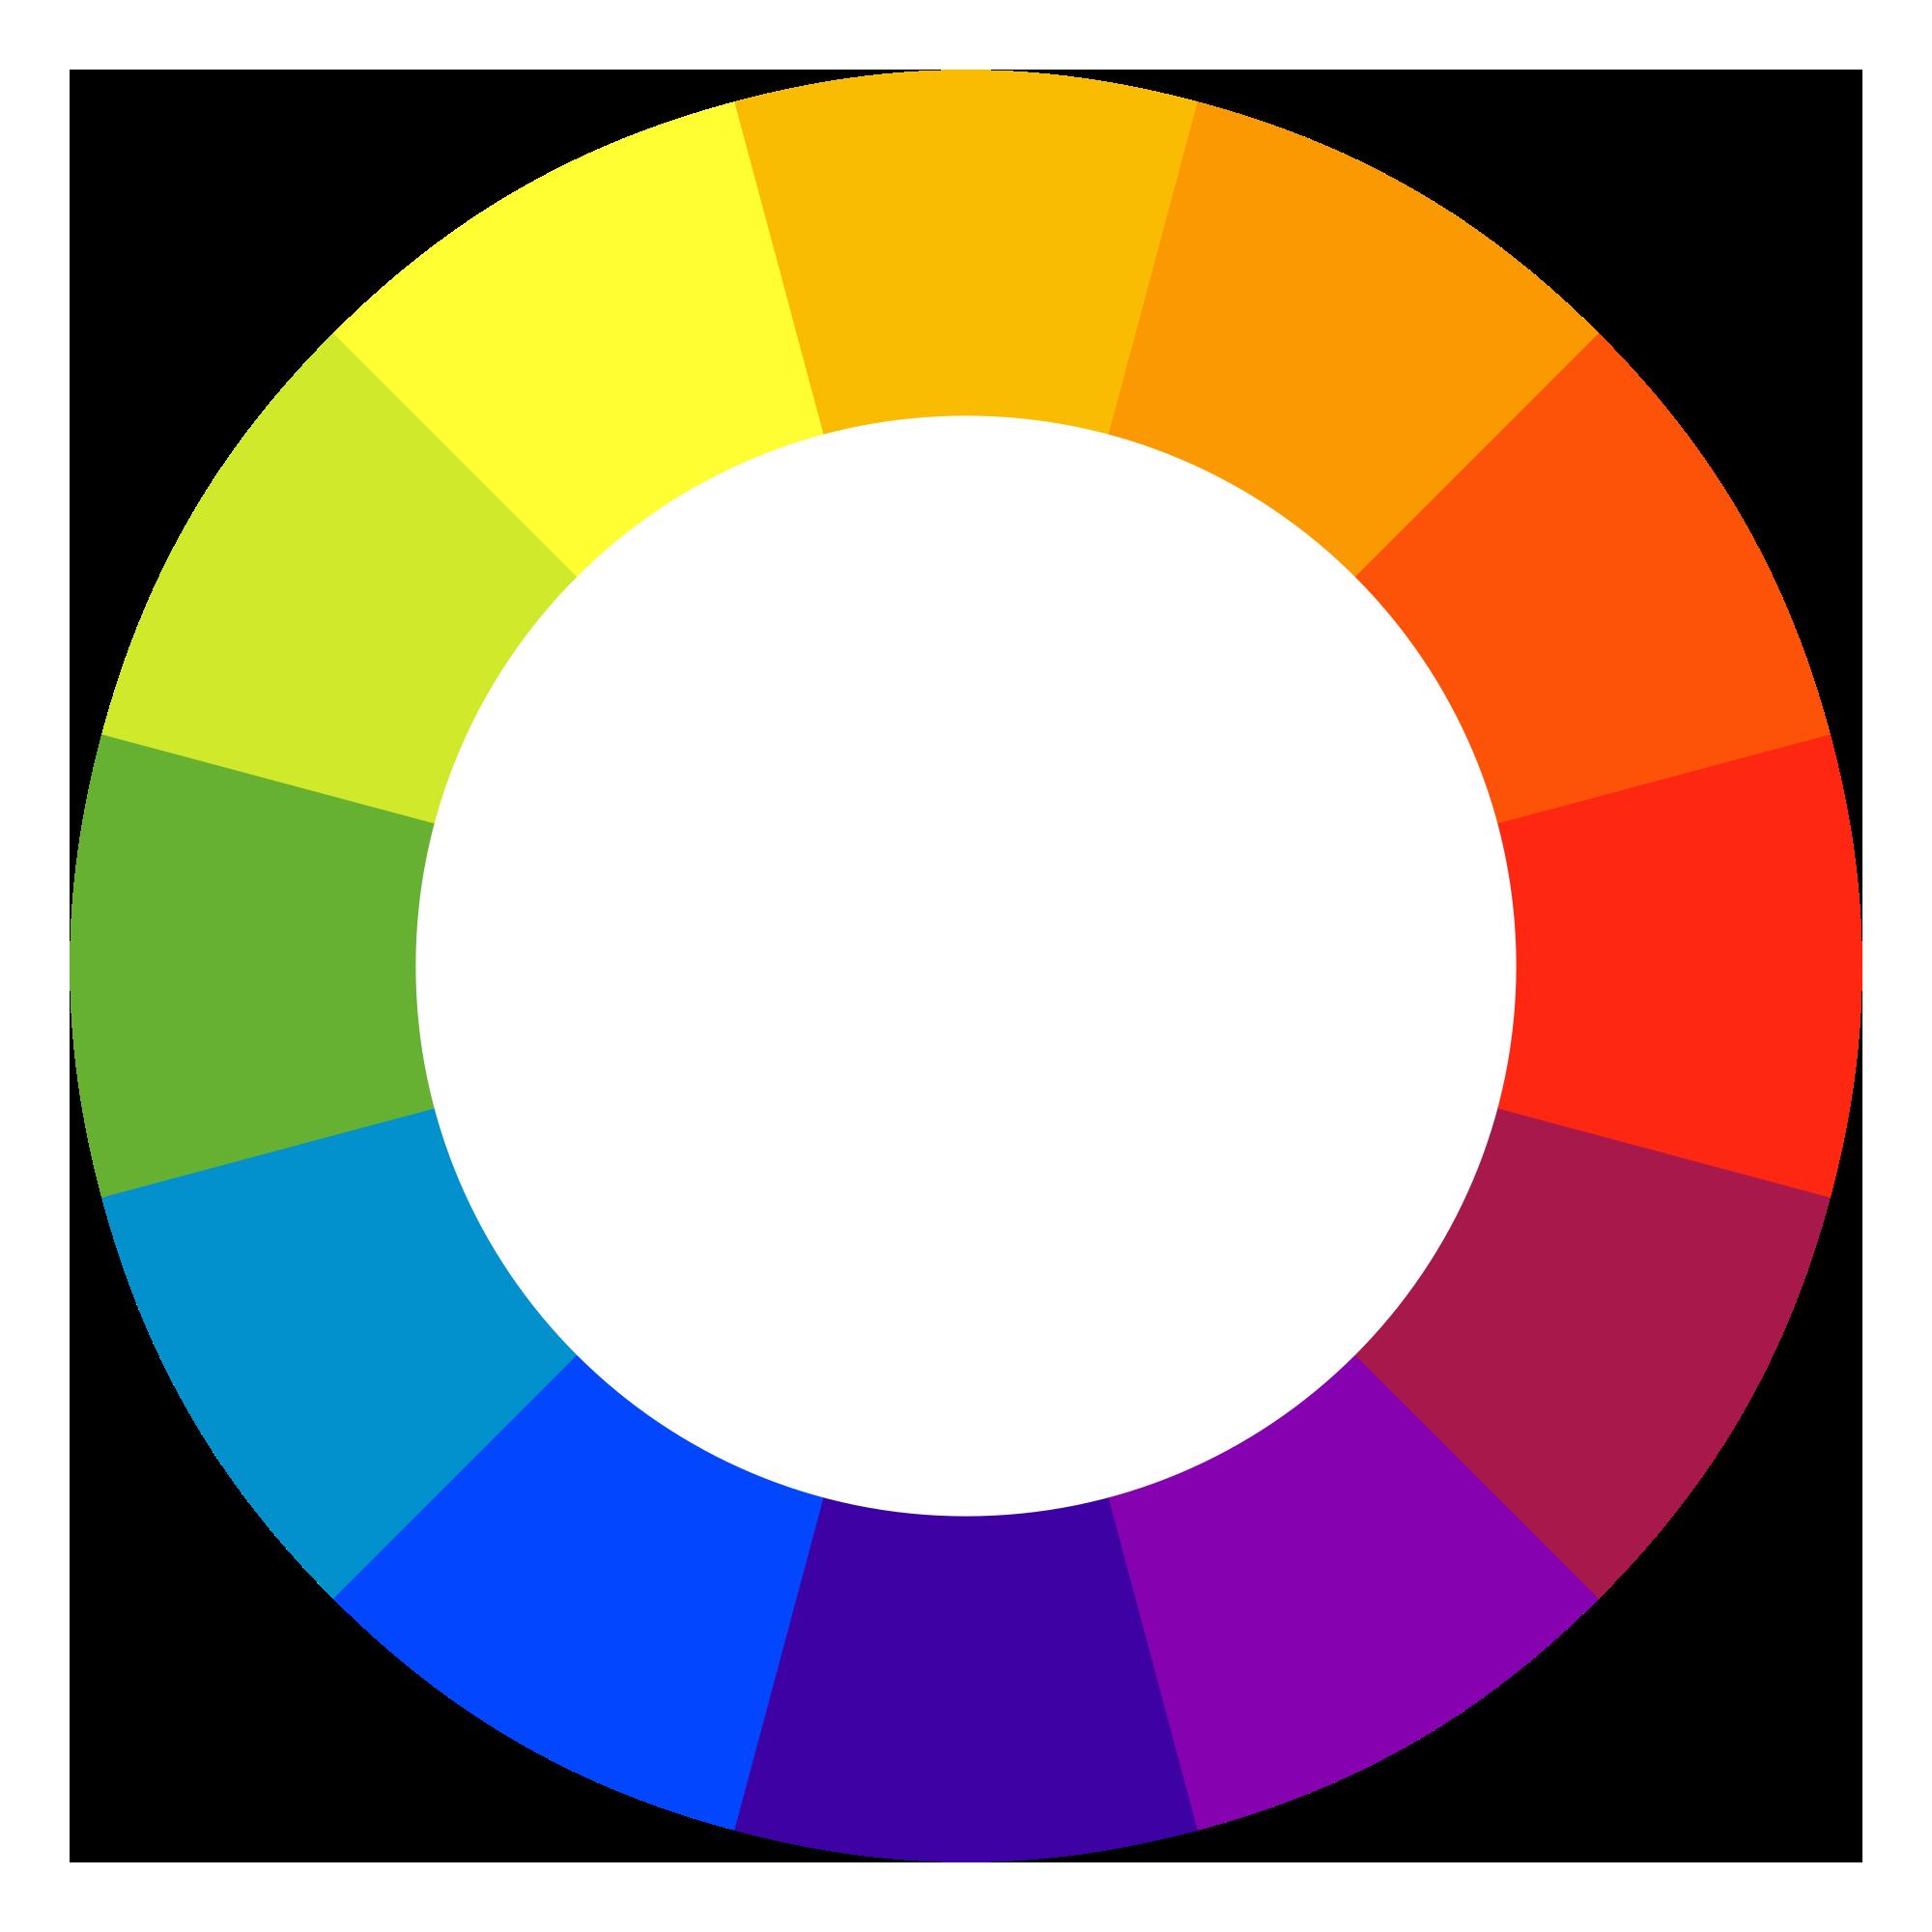 چرخه کامل رنگ ها